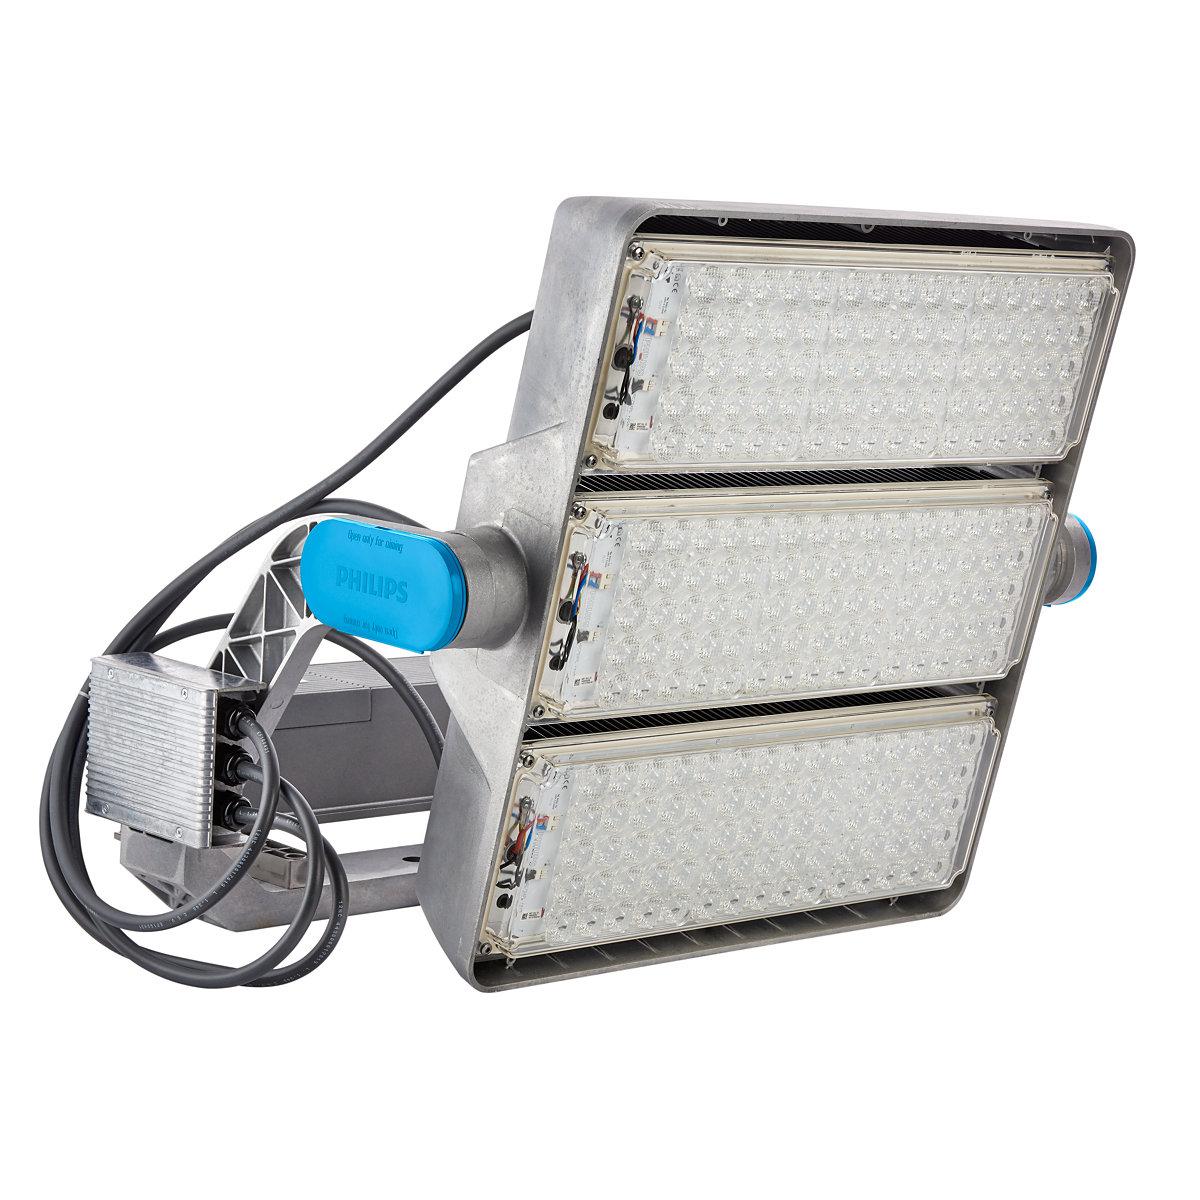 BVP425 1610/957 PSDMX 230V HGB S2 T25 ArenaVision LED gen2 ...